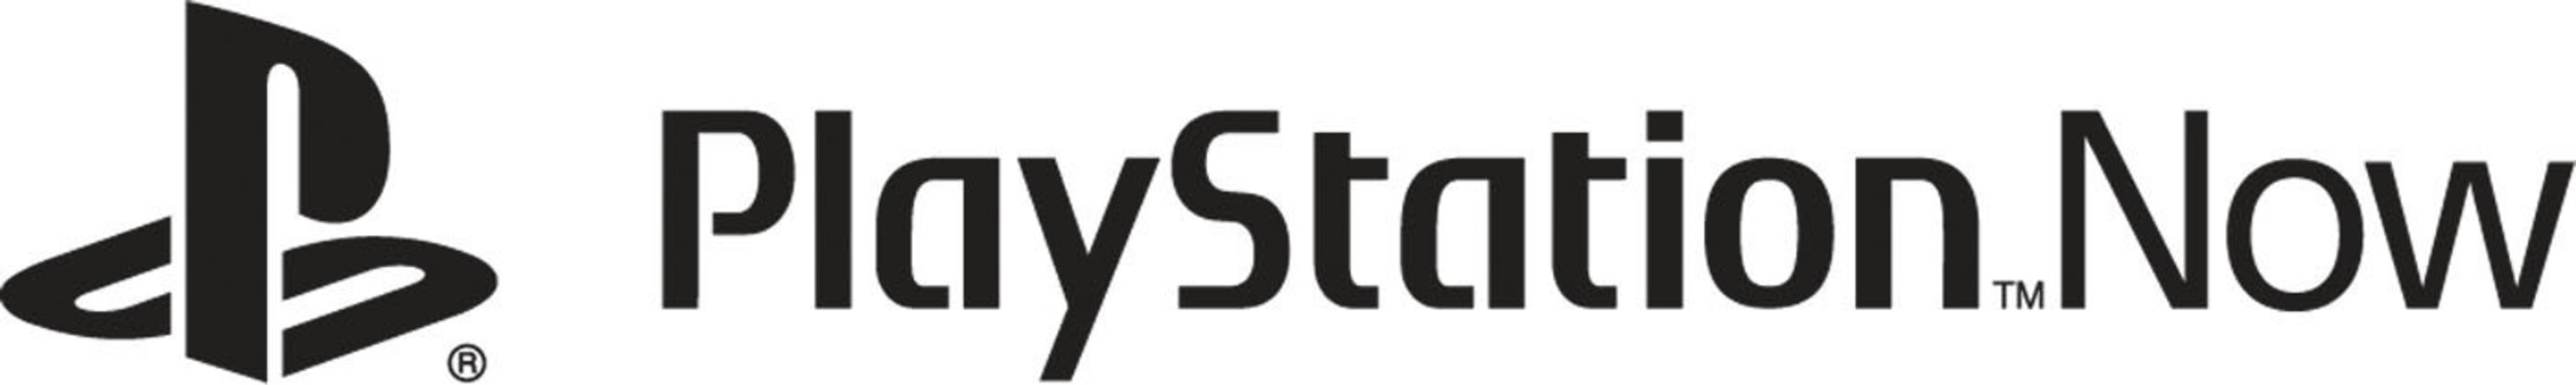 PlayStation(TM)Now Logo. (PRNewsFoto/Sony Computer Entertainment Inc.) (PRNewsFoto/SONY COMPUTER ENTERTAINMENT INC.)